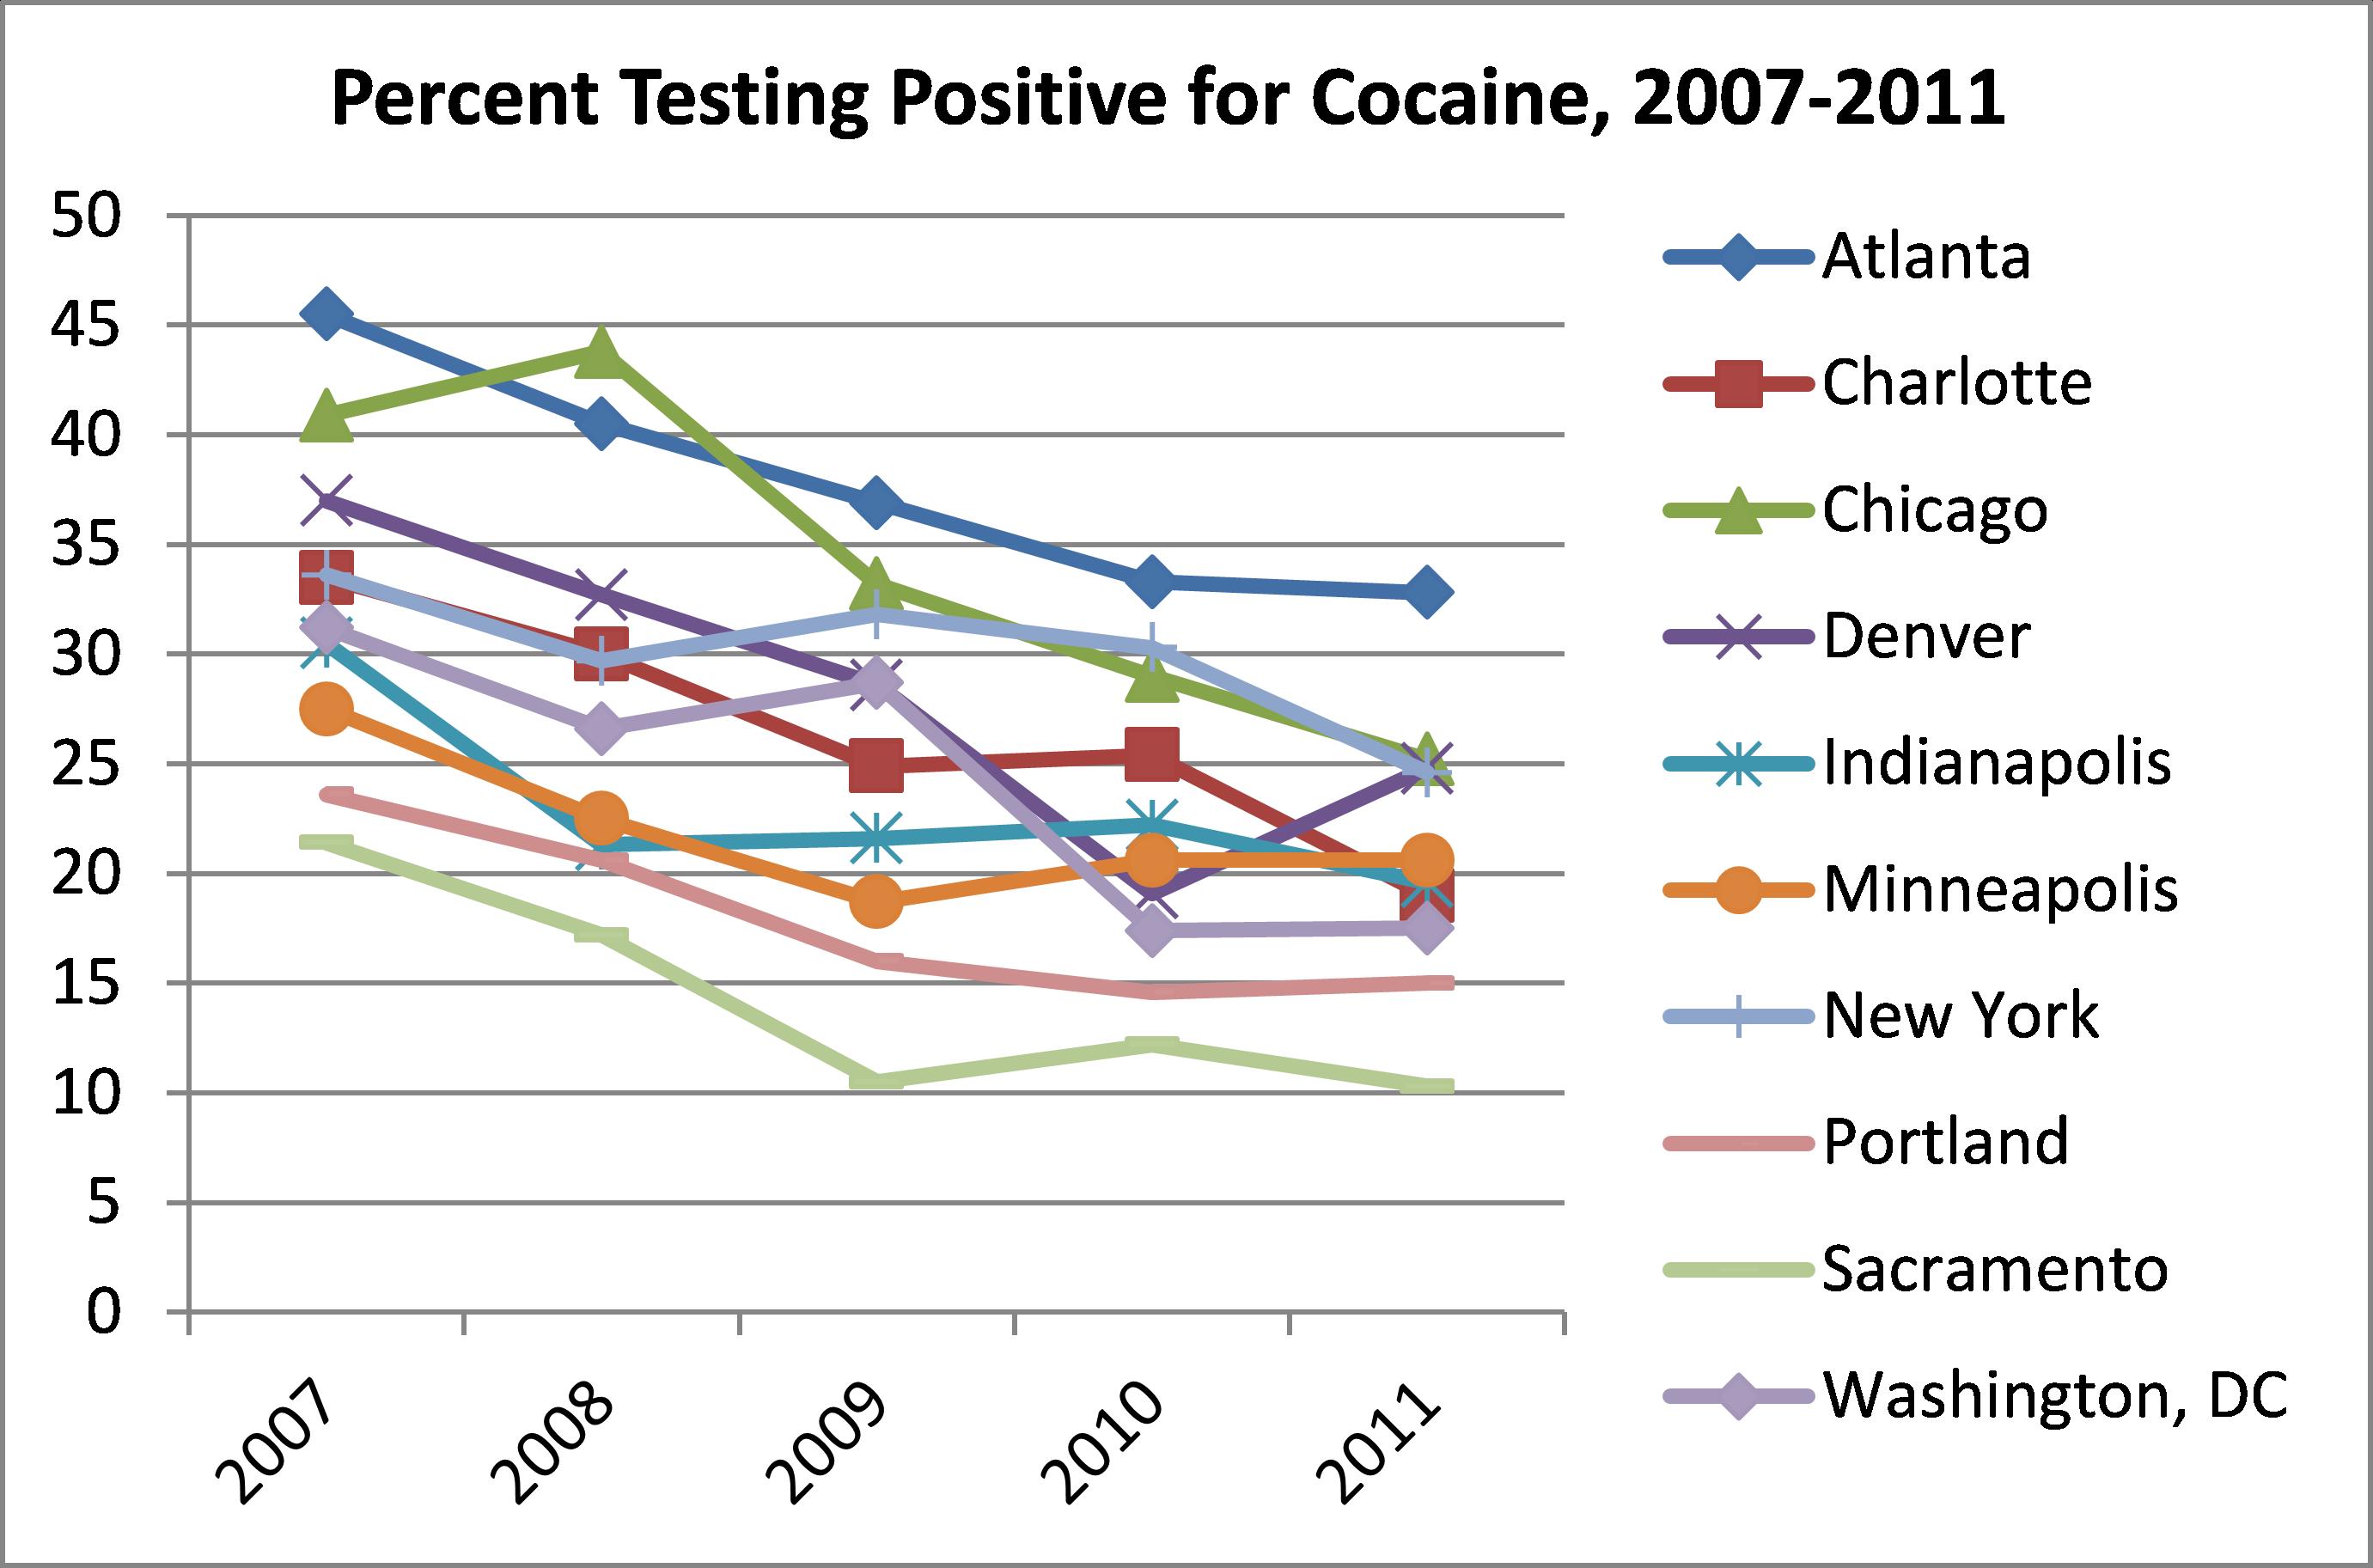 The Arrestee Drug Abuse Monitoring (ADAM II) 2011 Annual